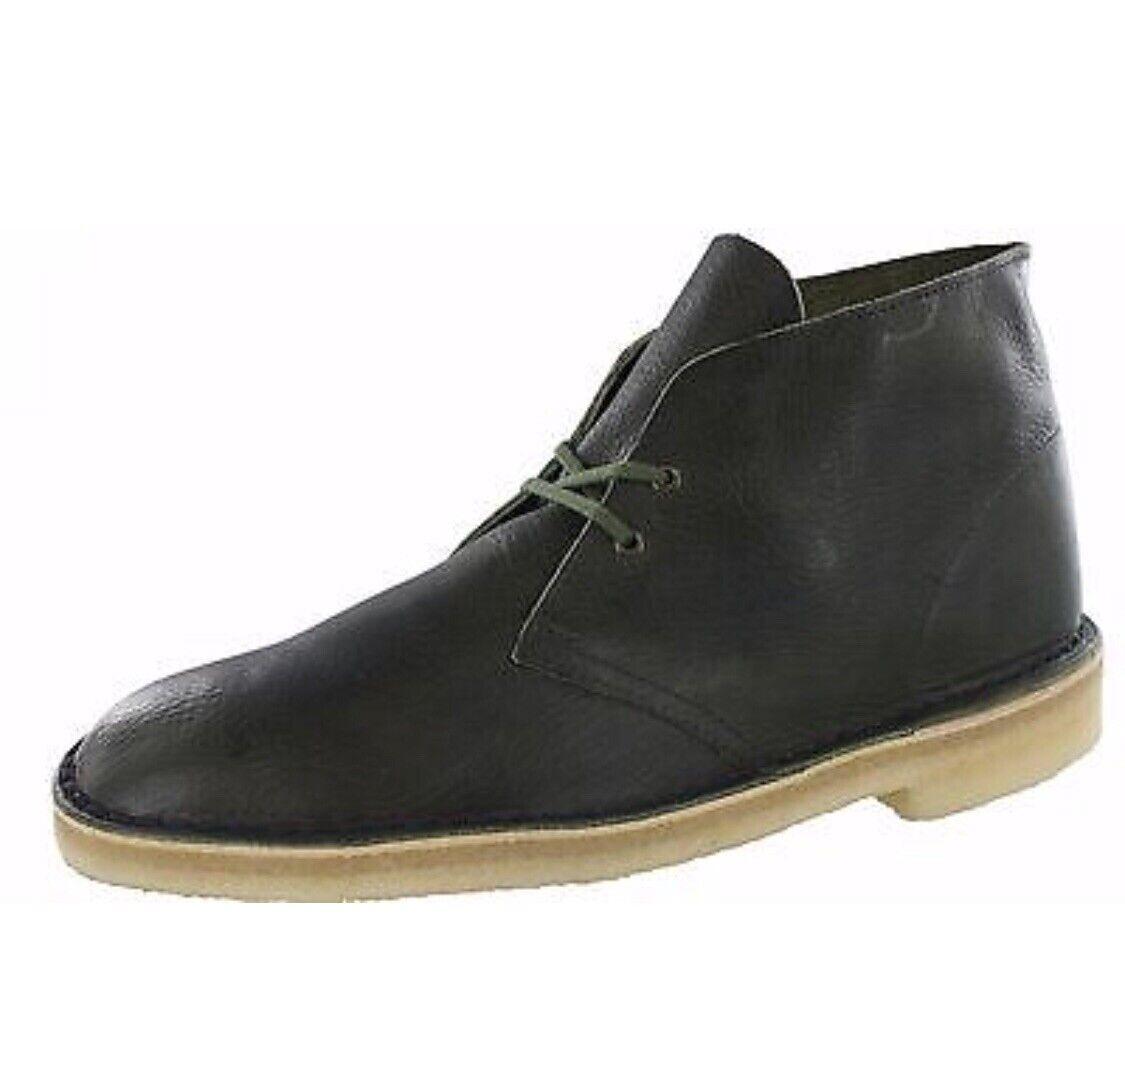 Clarks Originals Desert Boots Olive Leather. Men's Sizes. 26115534